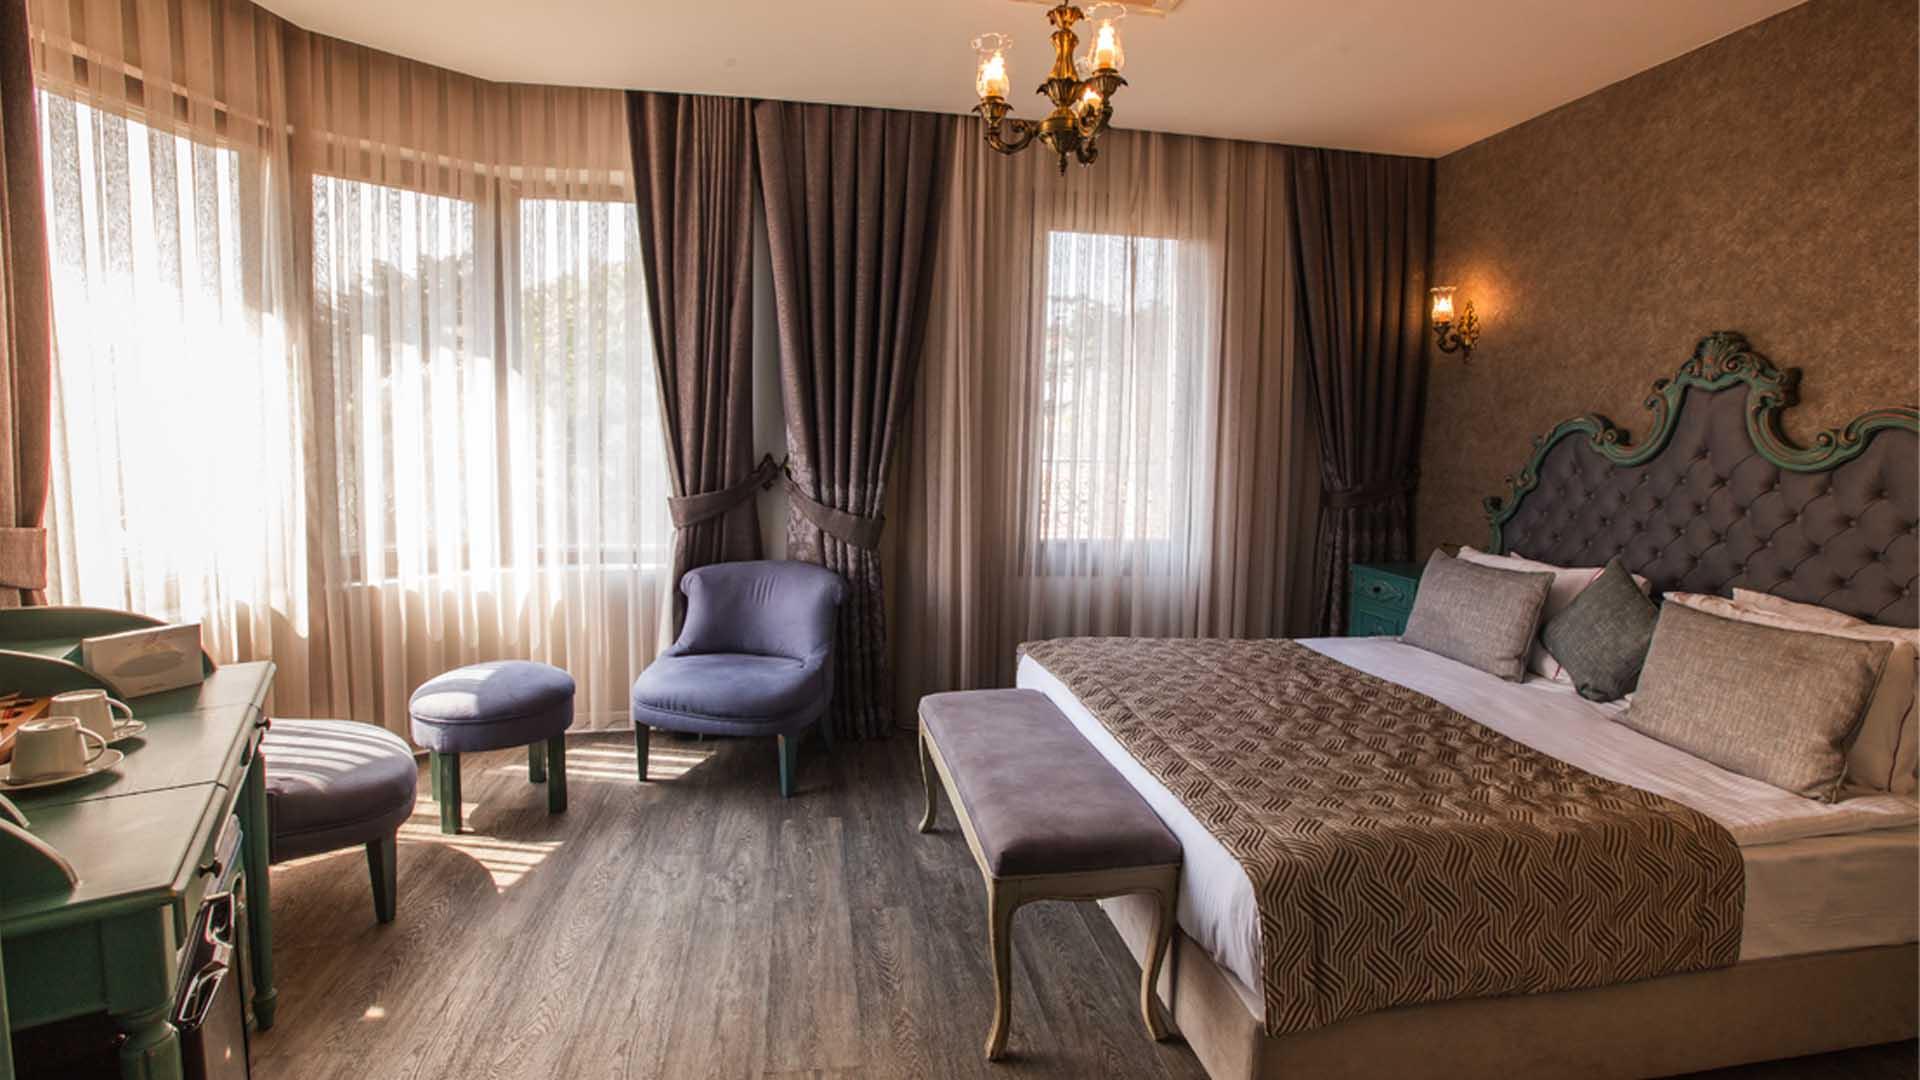 idylle-hotel-deluxe-room-bed